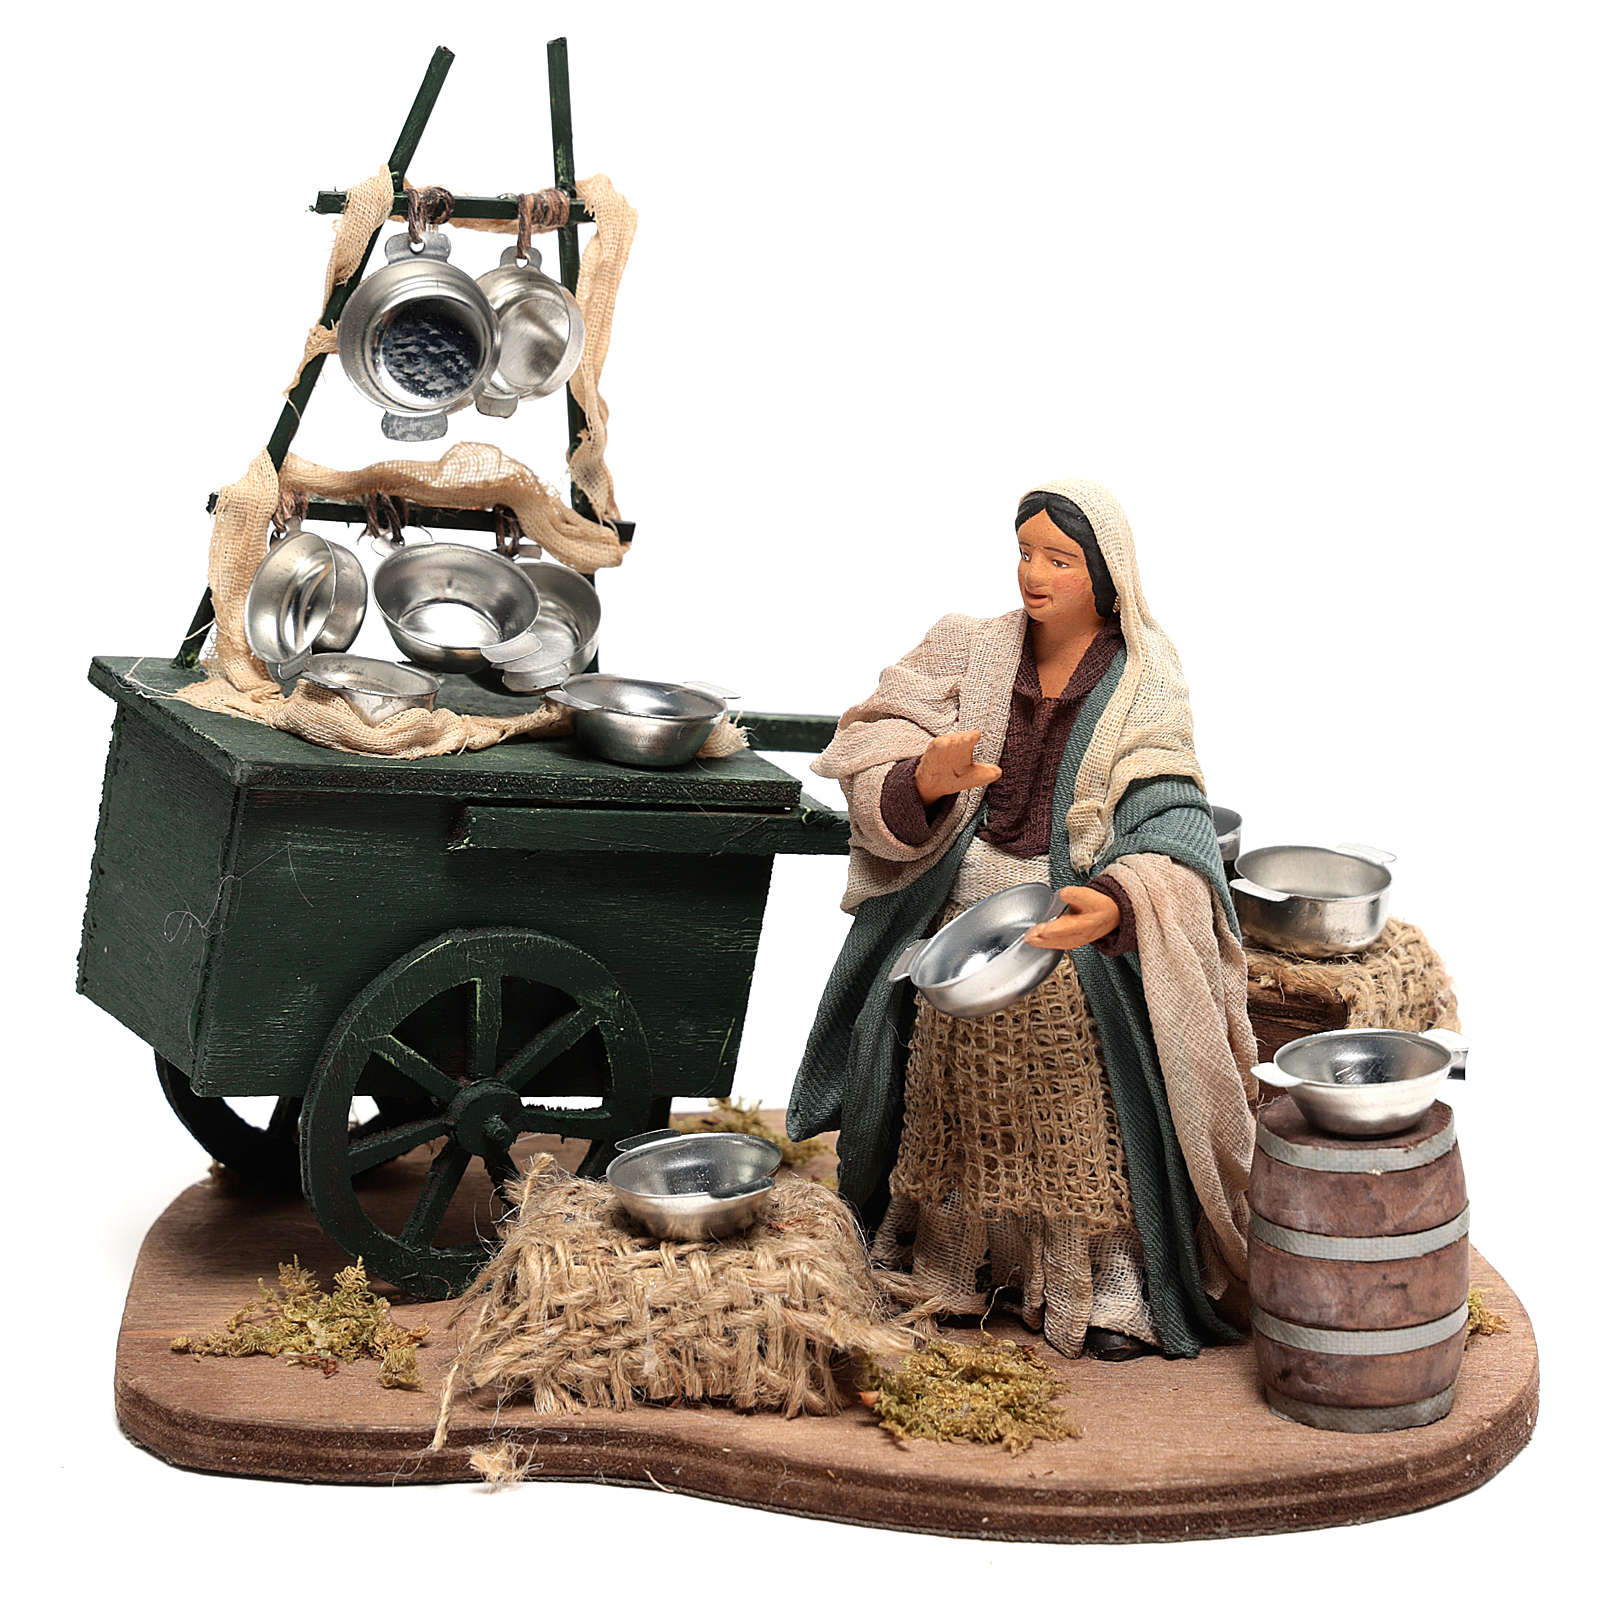 Vendedora con carro ollas18x19x10 cm movimiento para belén Nápoles de 10 cm 4